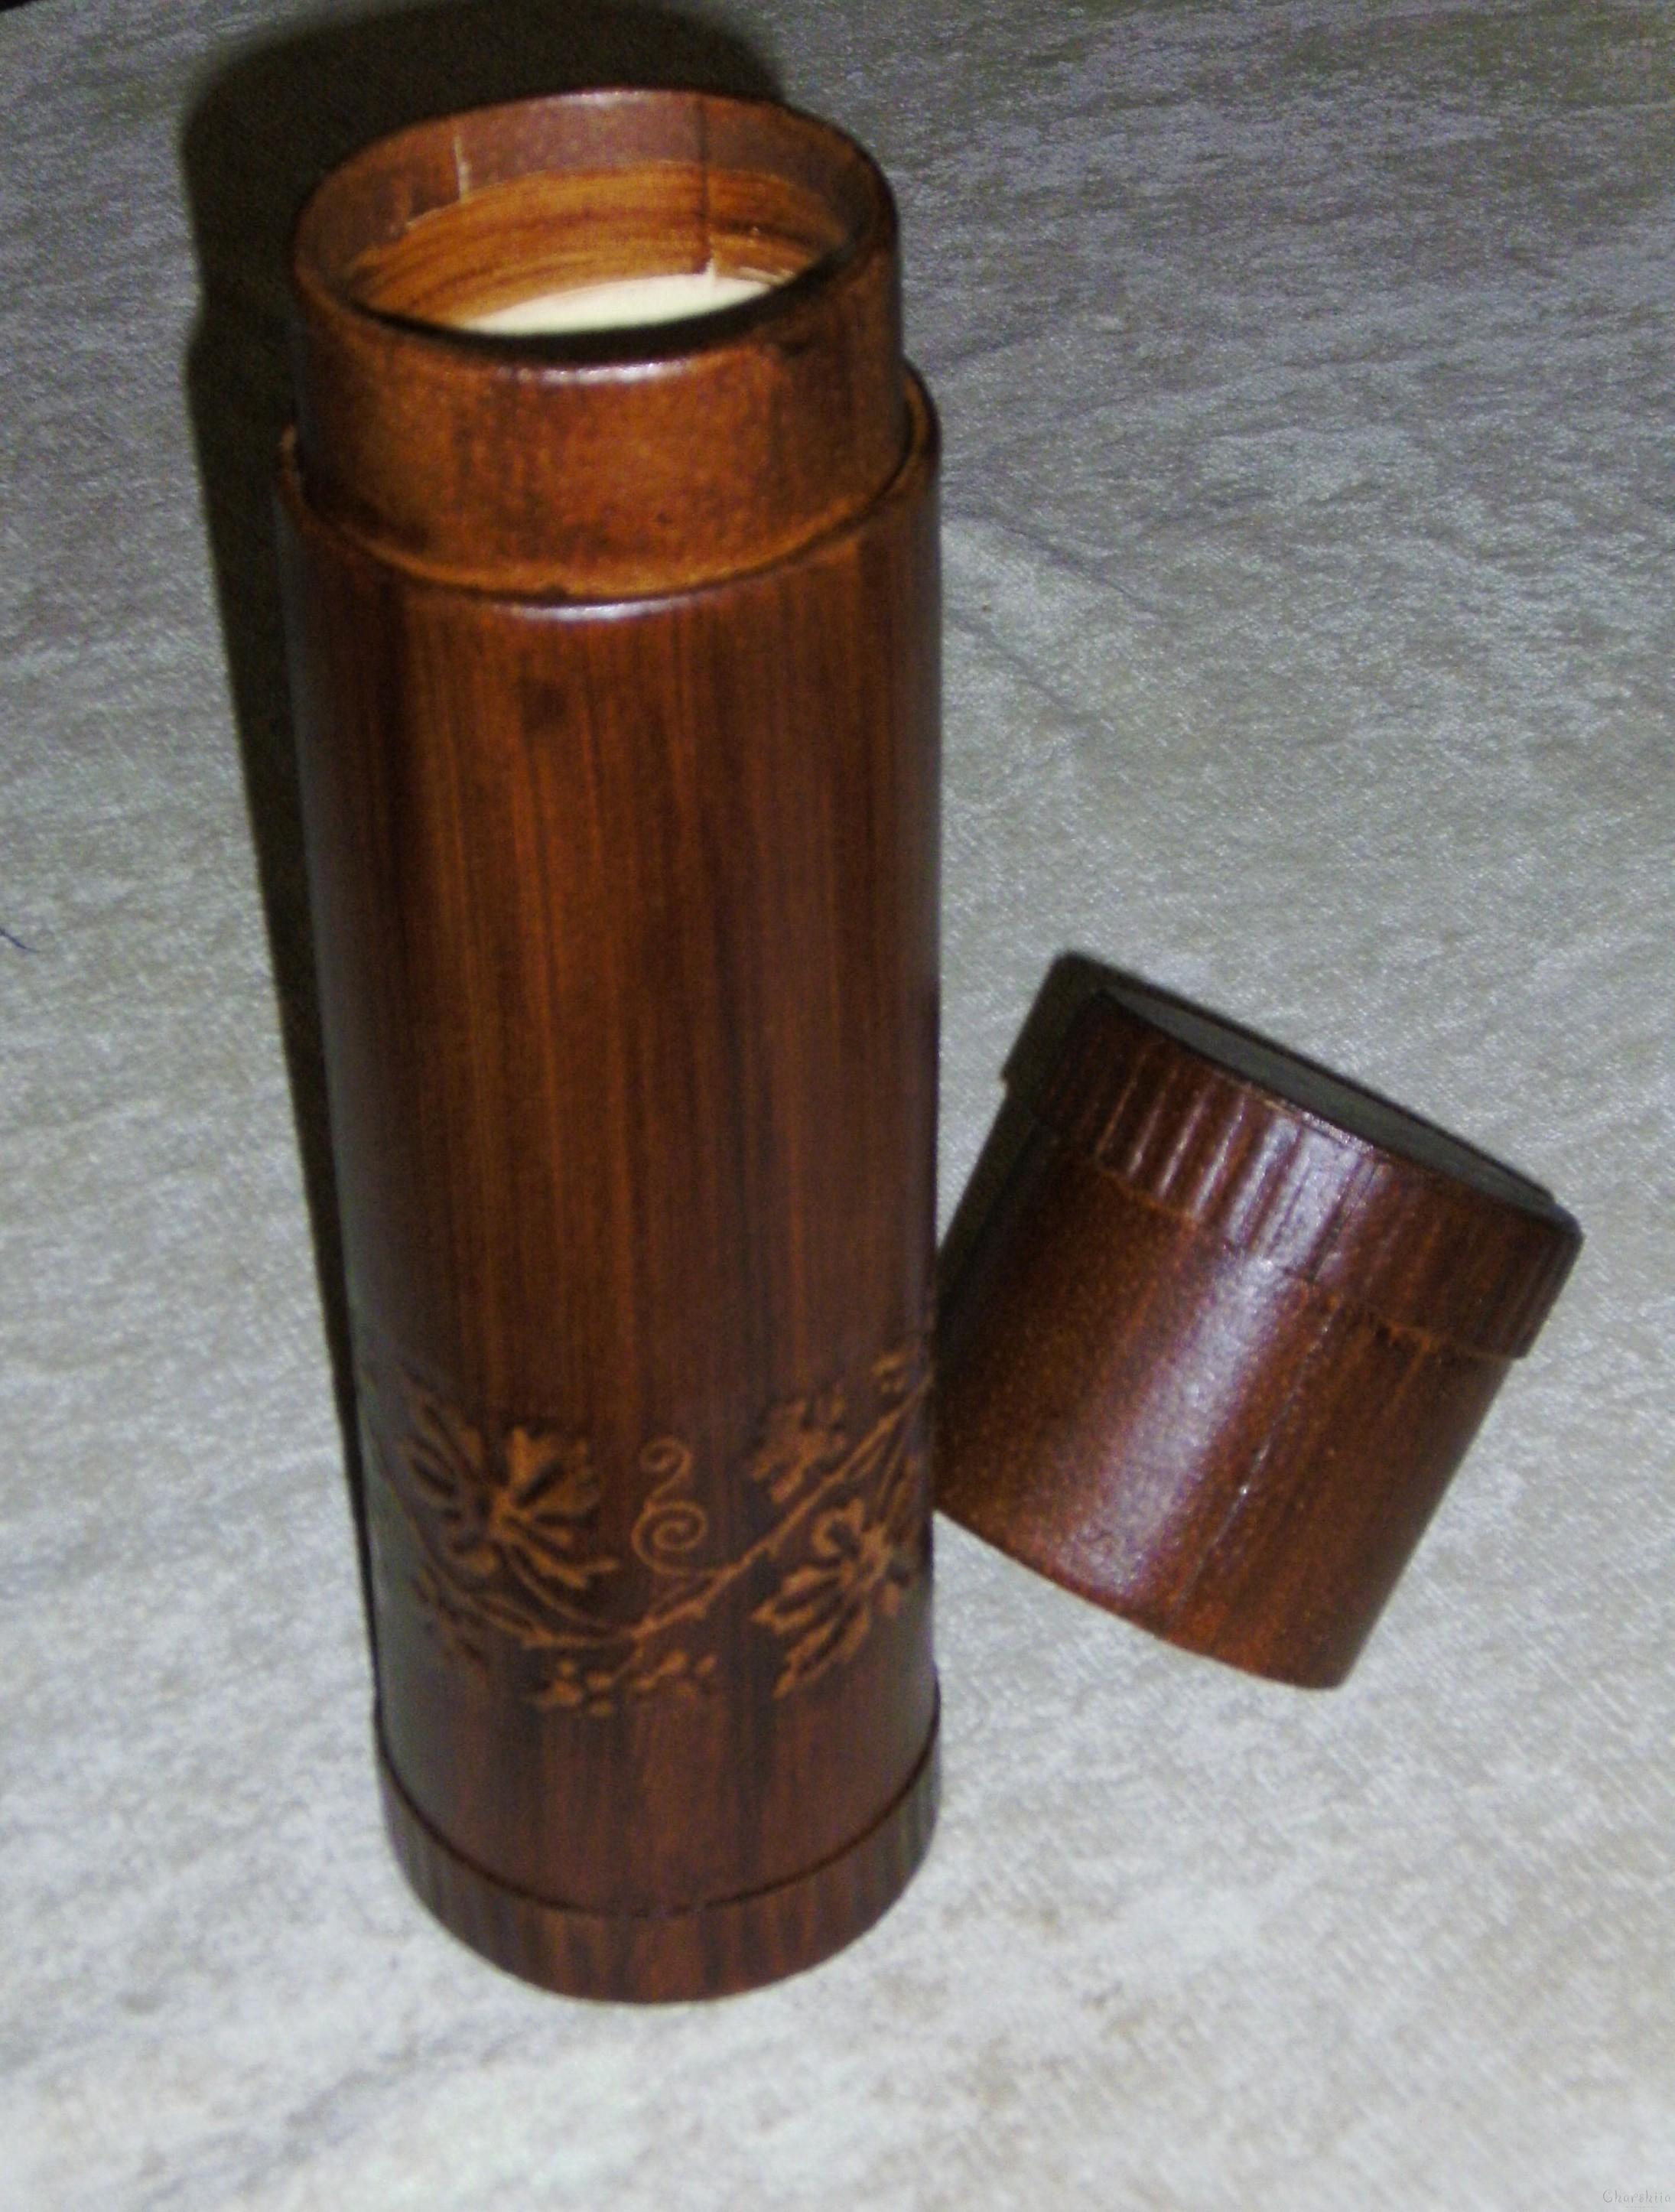 Tube/wine bottle box or a wine bottle box, handmade, genuine leather